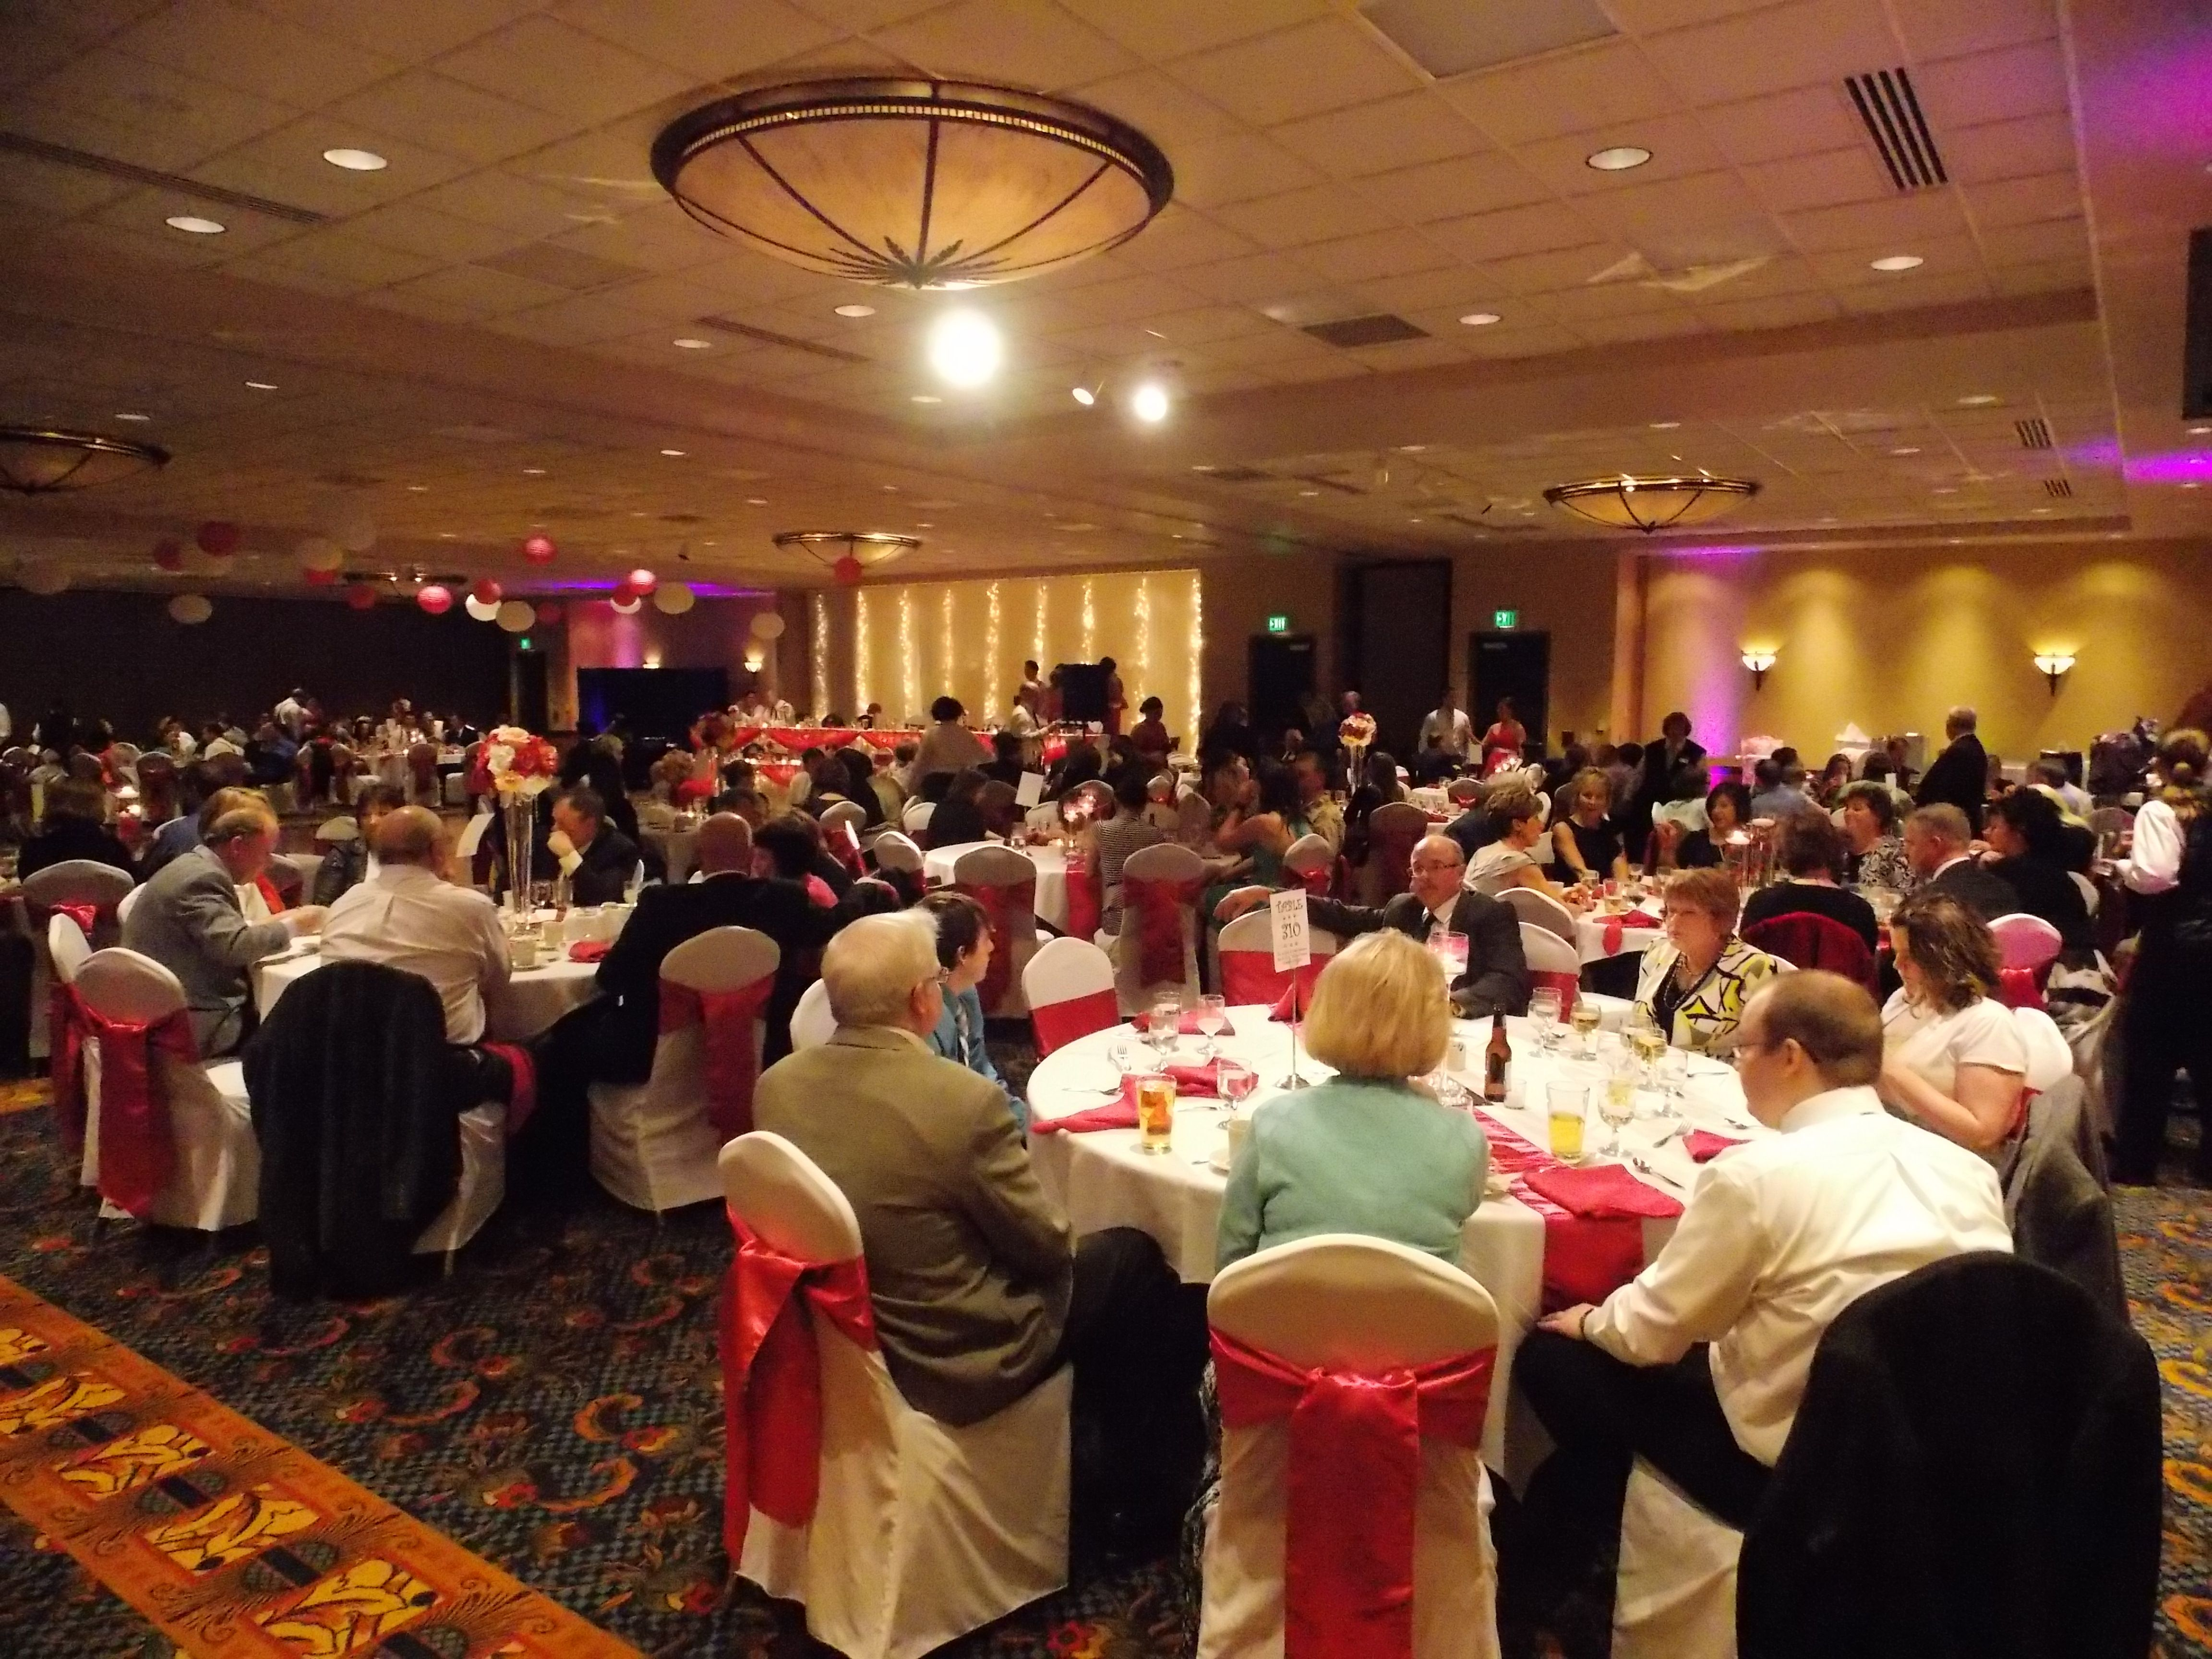 A View Of The Radisson Quad City Plaza Ballroom Davenport Iowa Photo By Marske Music Productions Kirk Marske Dj Quad Cities Banquet Hall Company Party